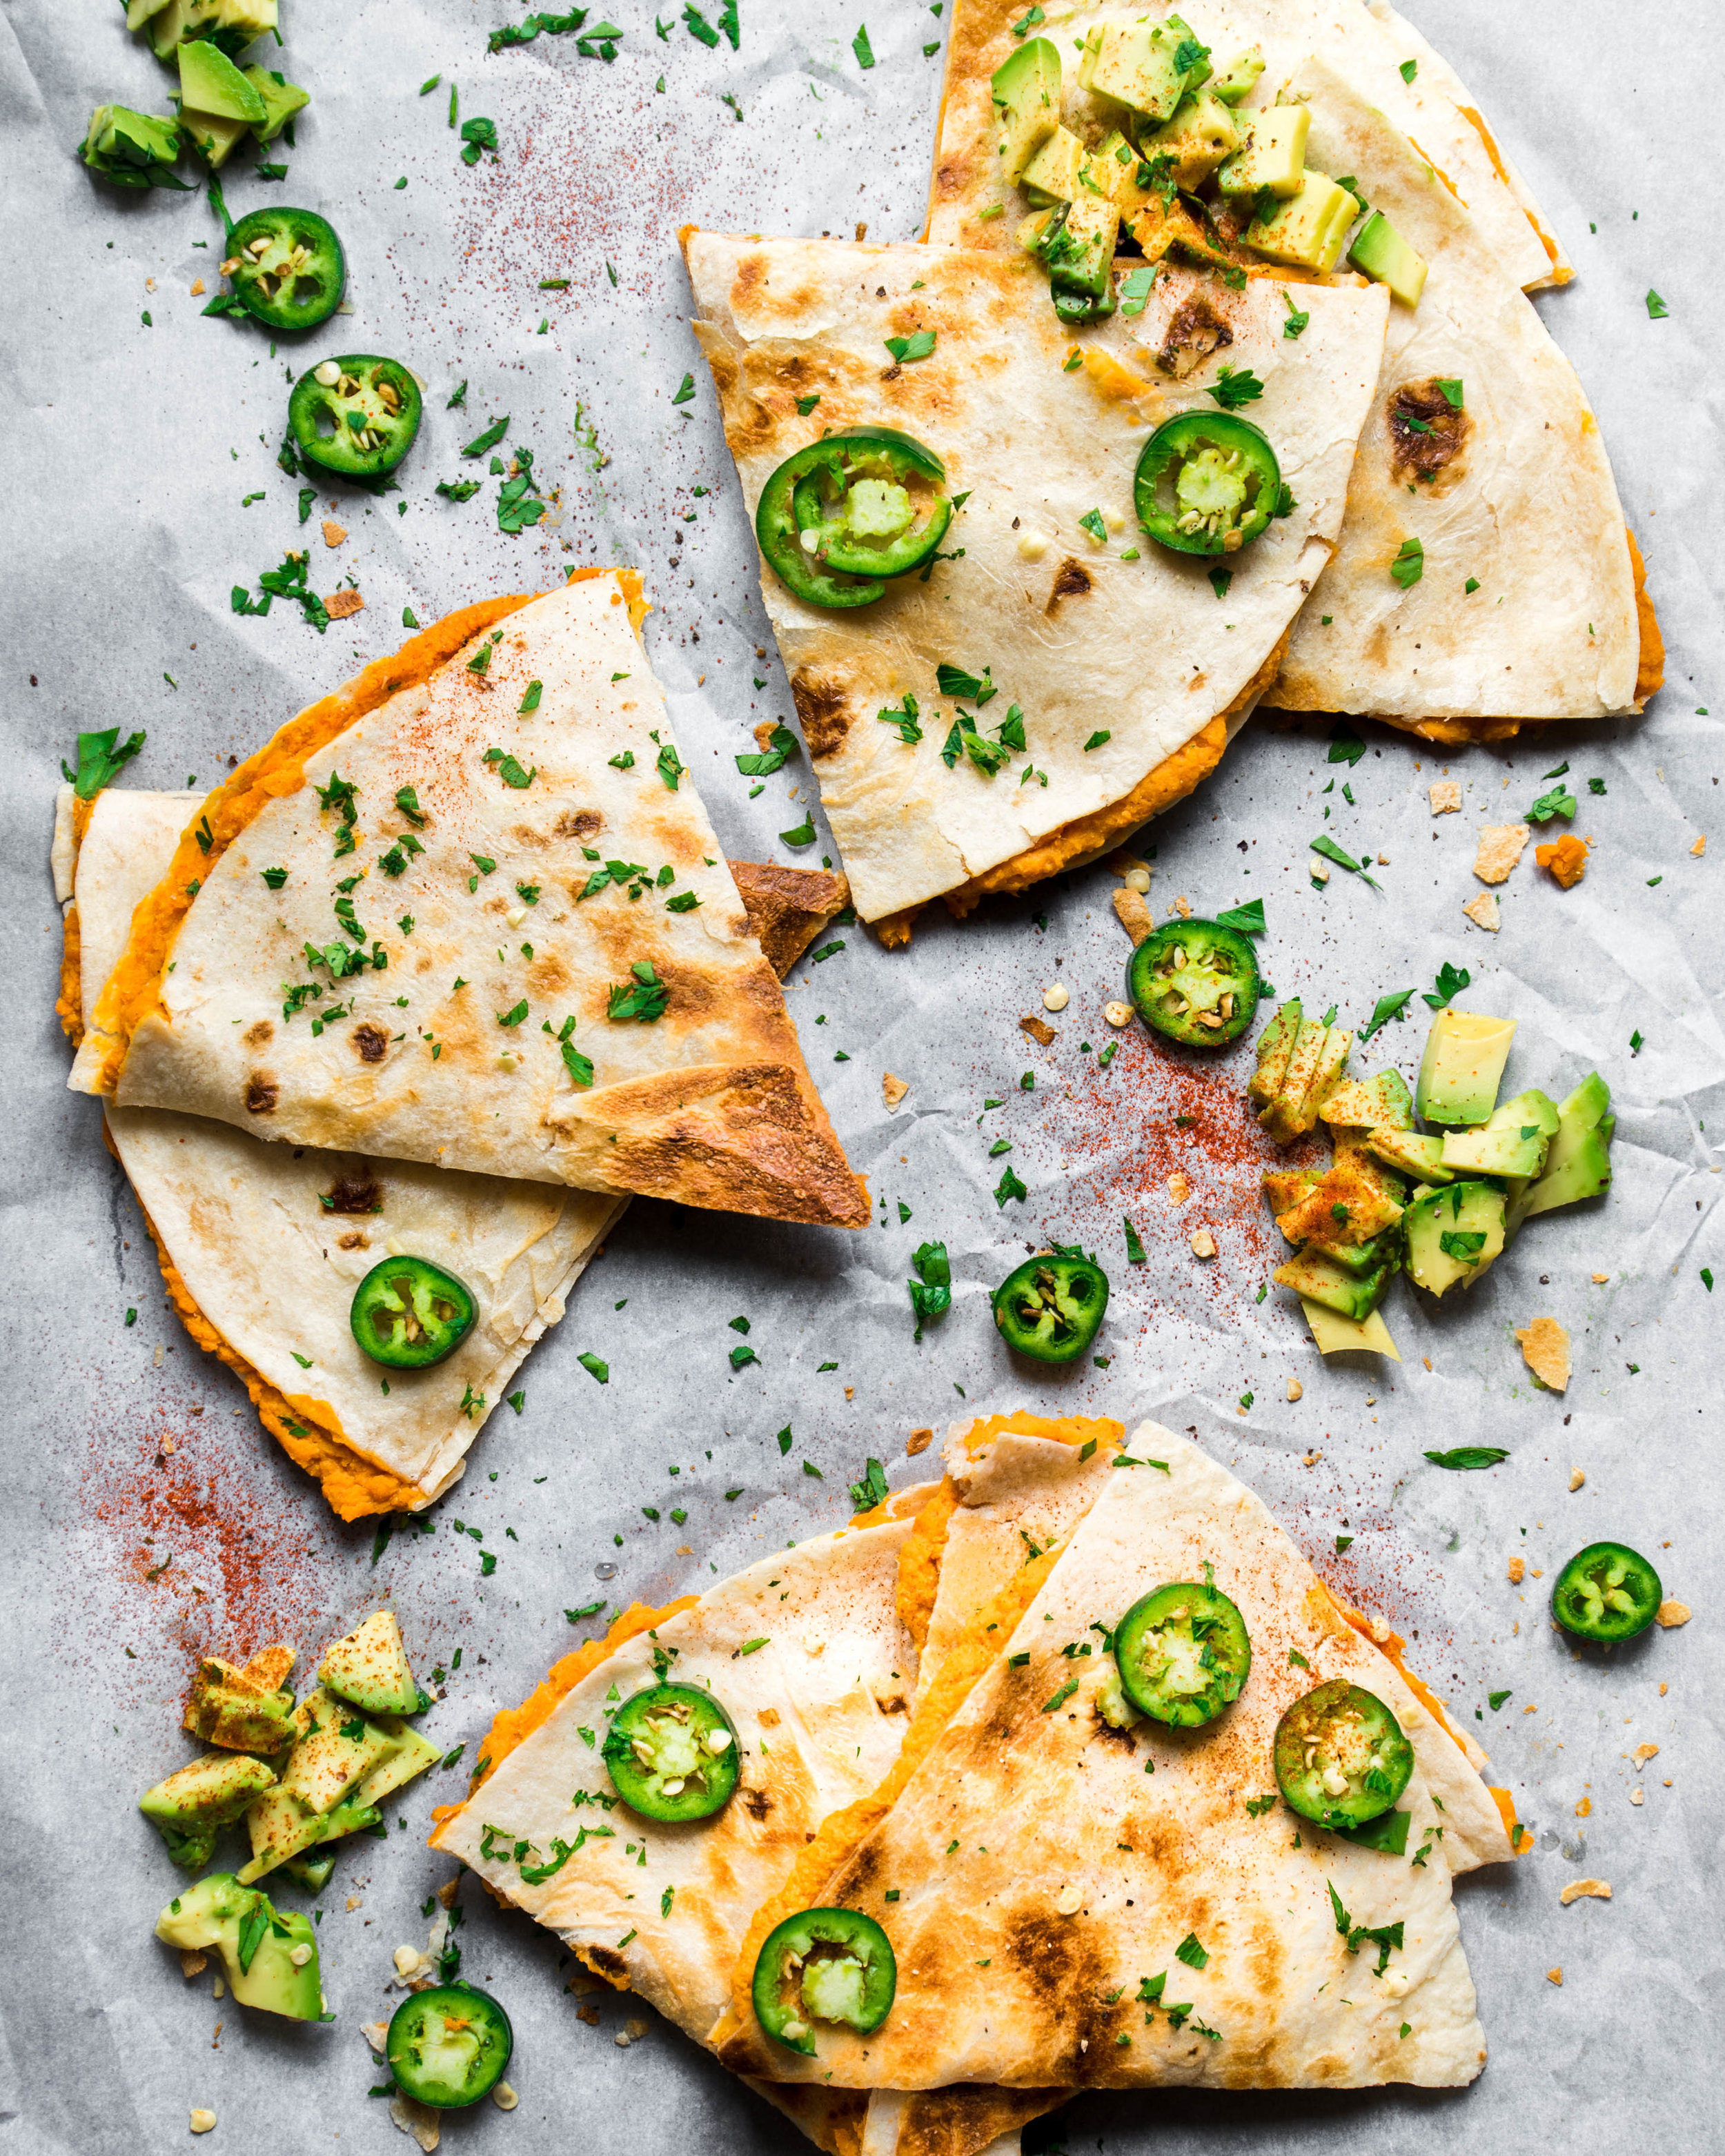 5-Ingredient Vegan Recipes, Sweet Potato Chickpea Quesadillas